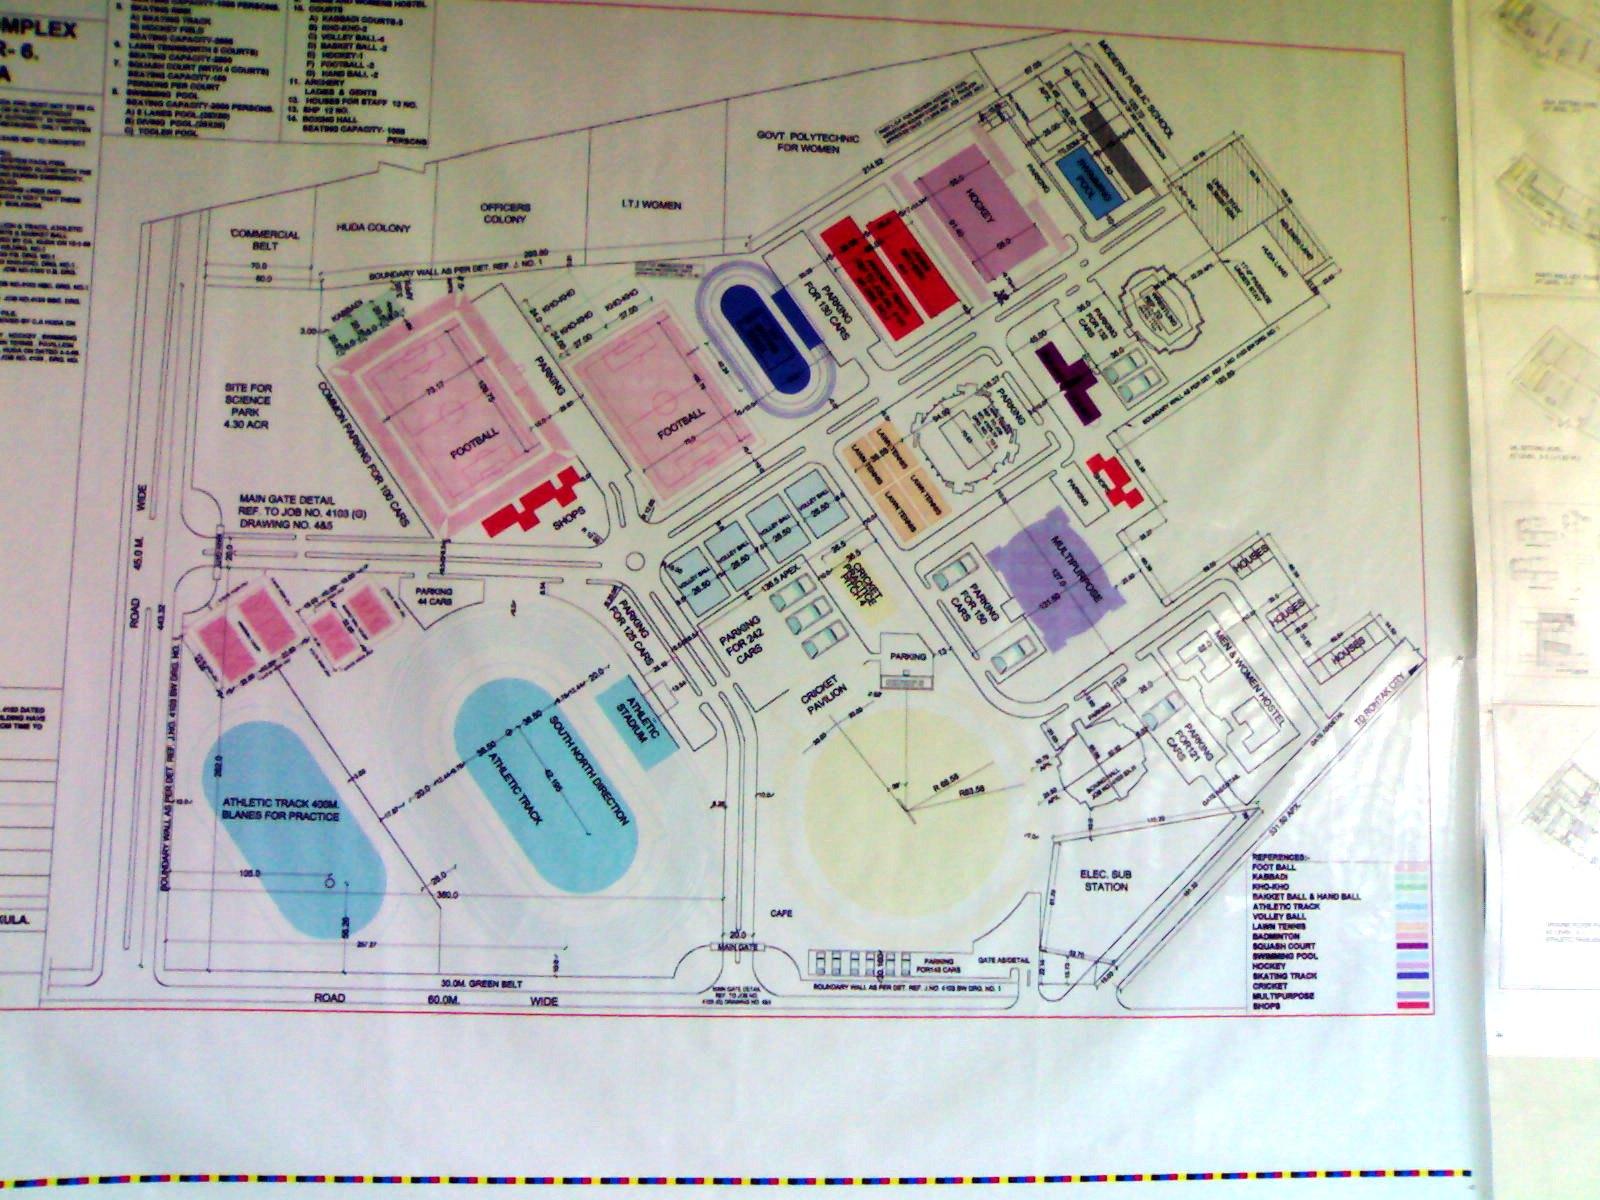 File:Rajiv Gandhi Sports Complex Plan.jpg - Wikimedia Commons